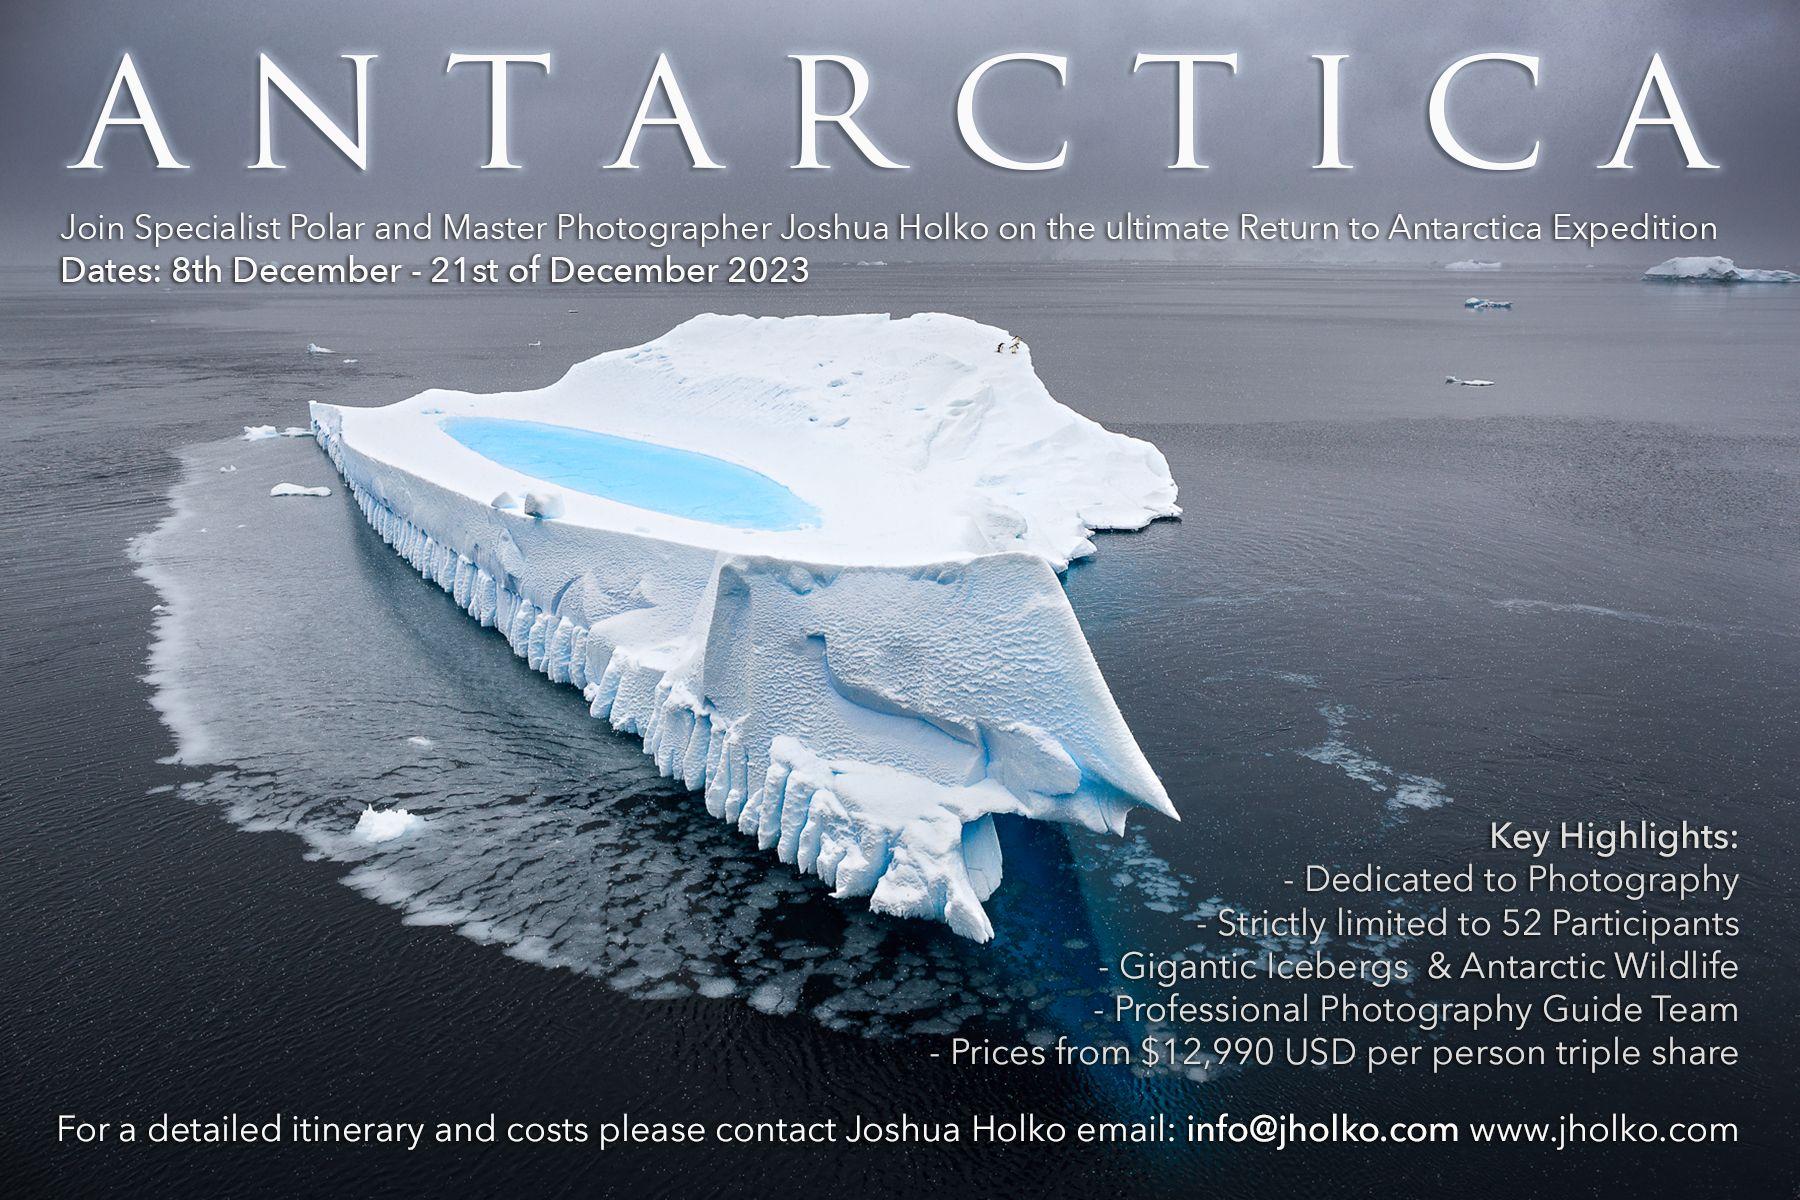 Antarctica Expedition with Joshua Holko 2023